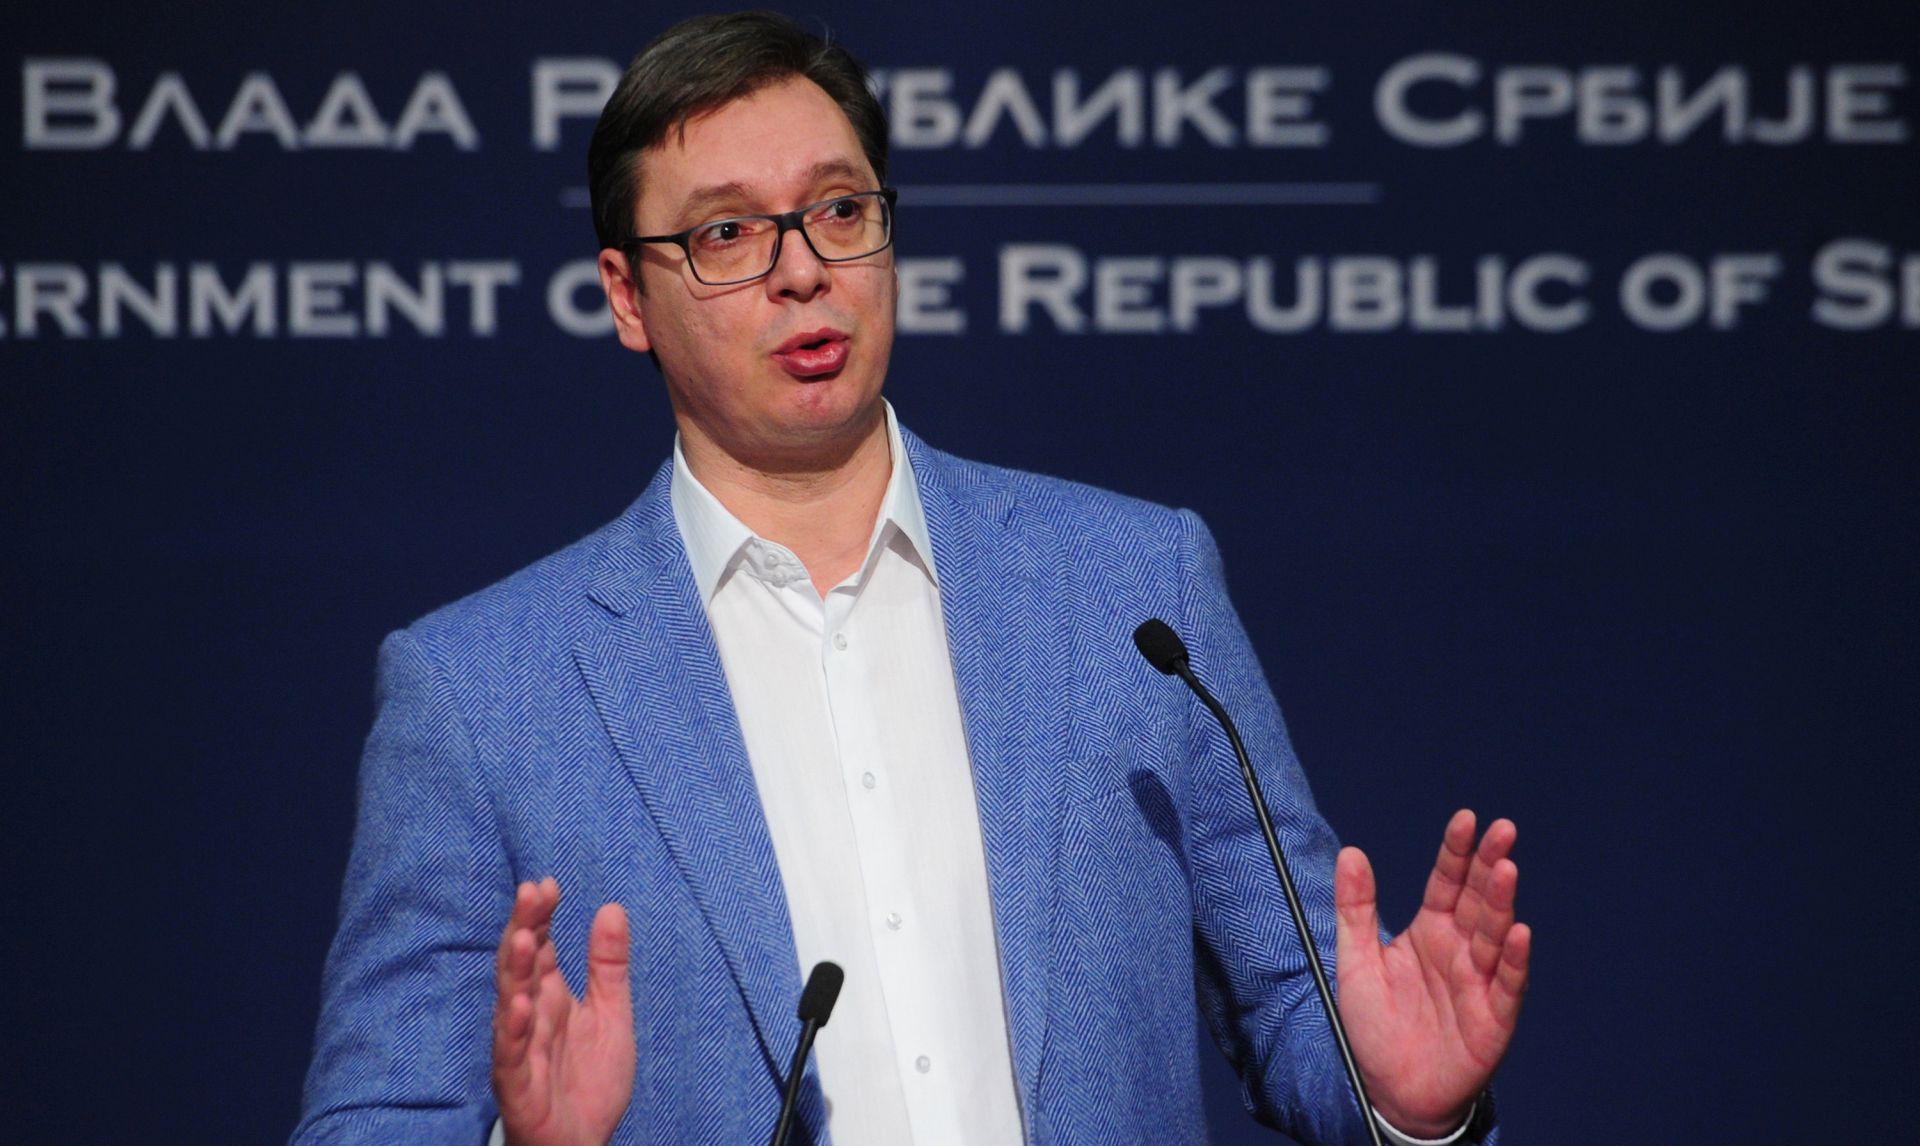 SRBIJA Vučić objavio predizborni spot